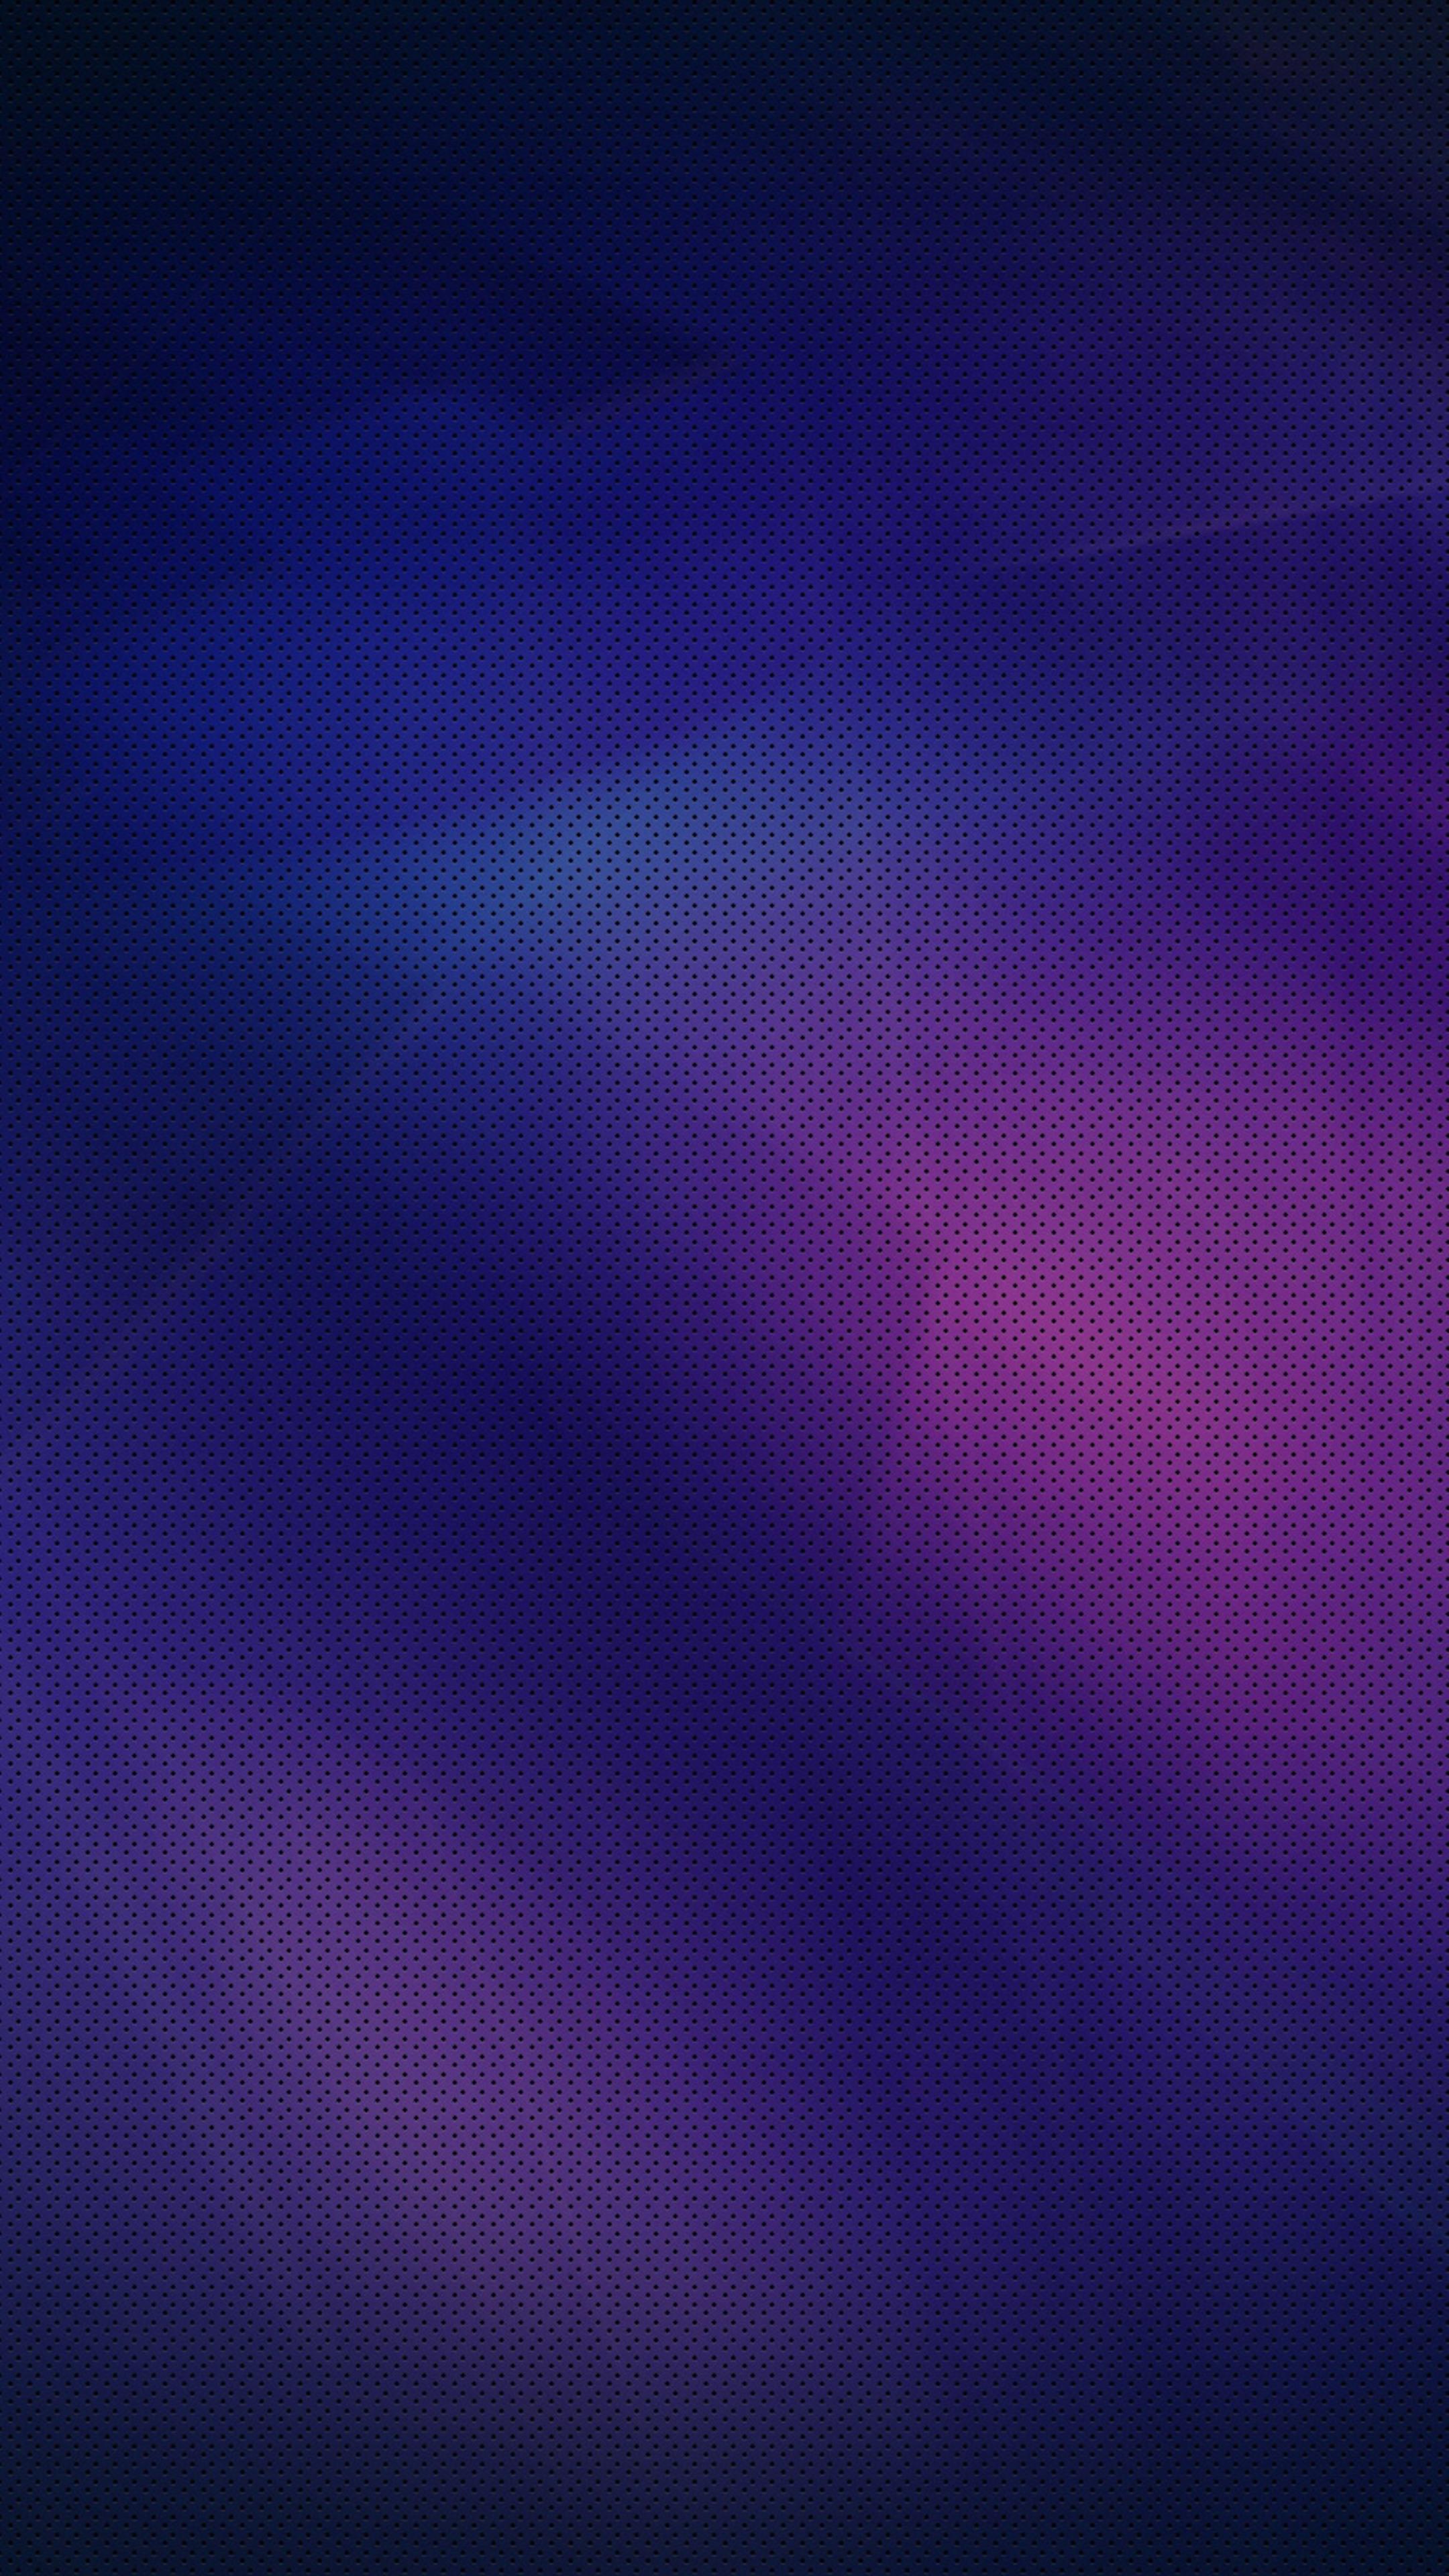 spots-colorful-background-lu.jpg